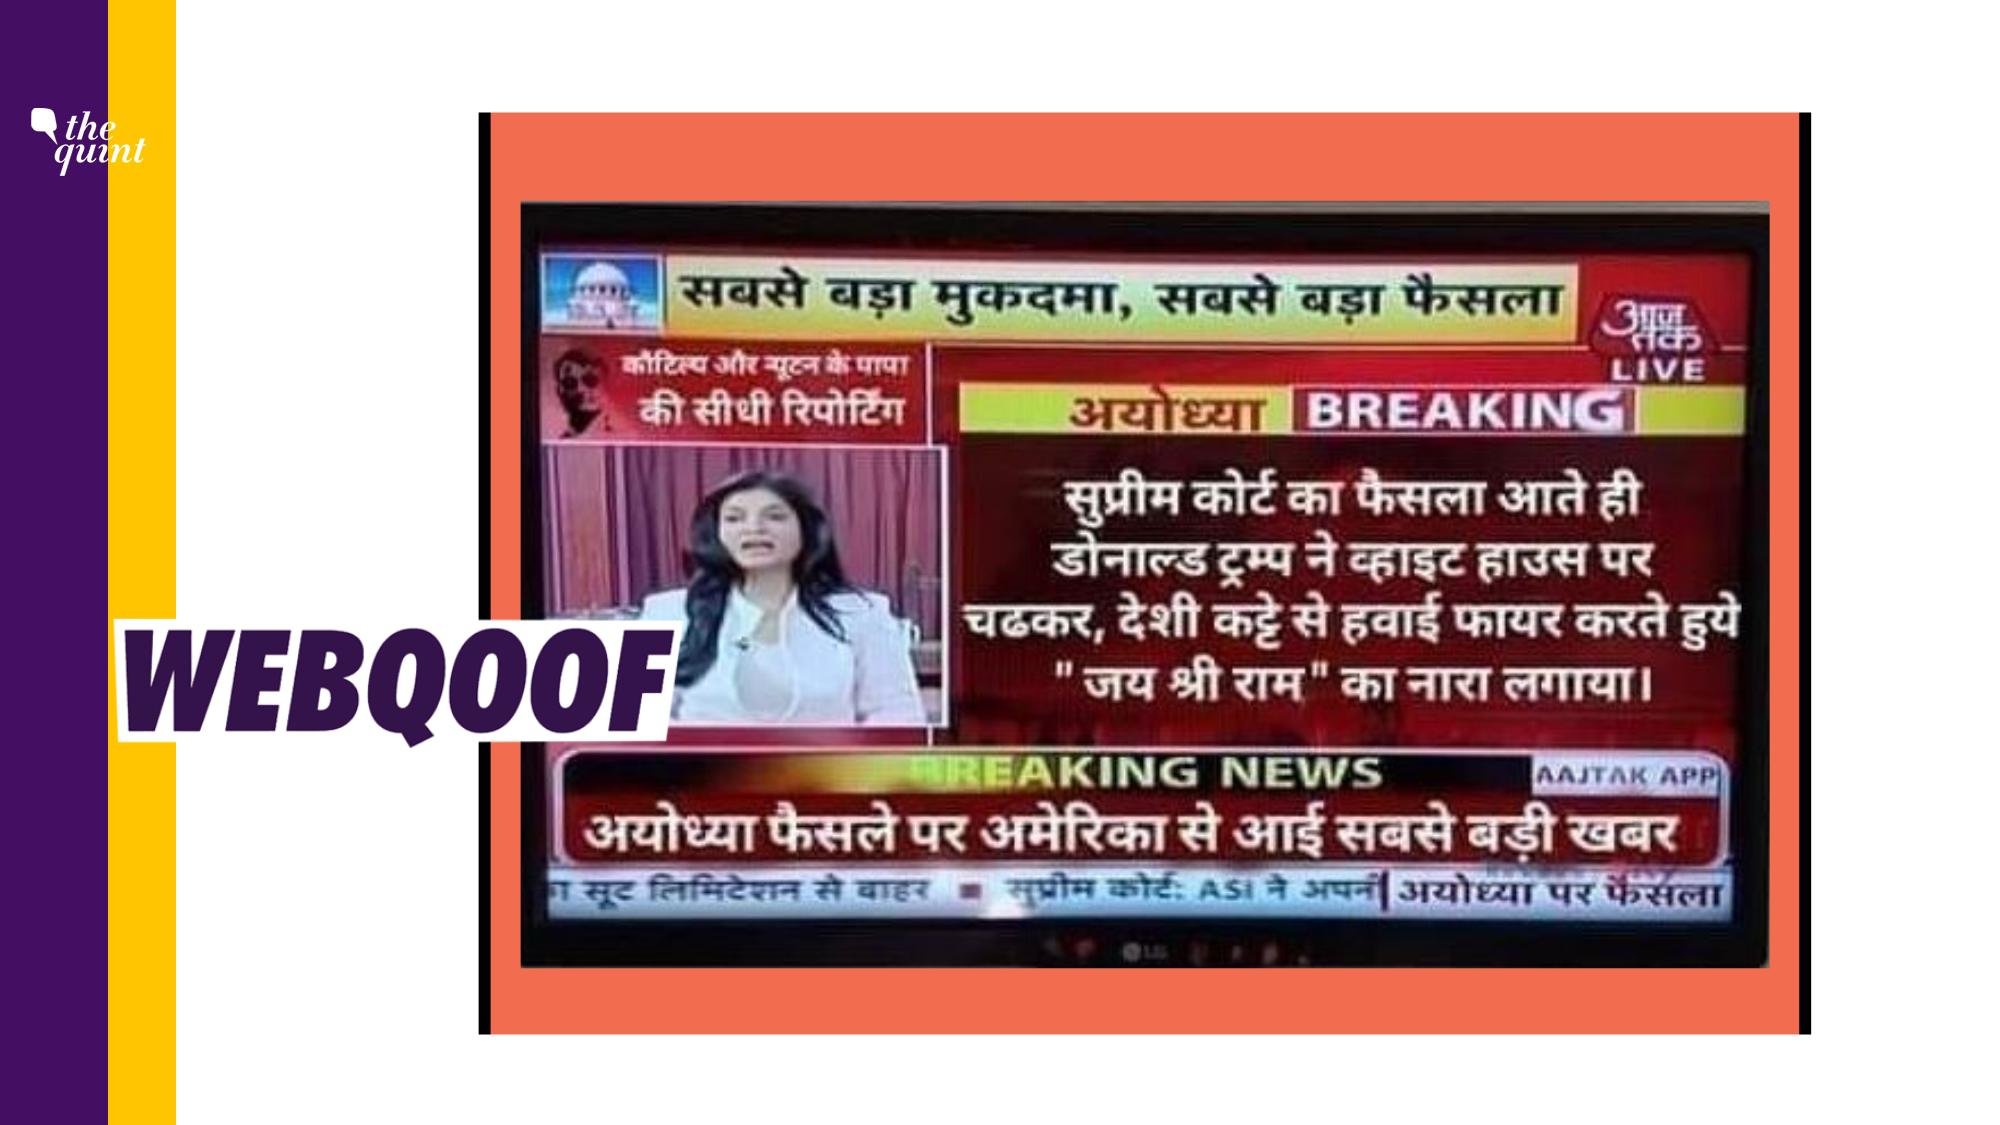 Fake Aaj Tak Image of Trump Celebrating Ayodhya Verdict Goes Viral